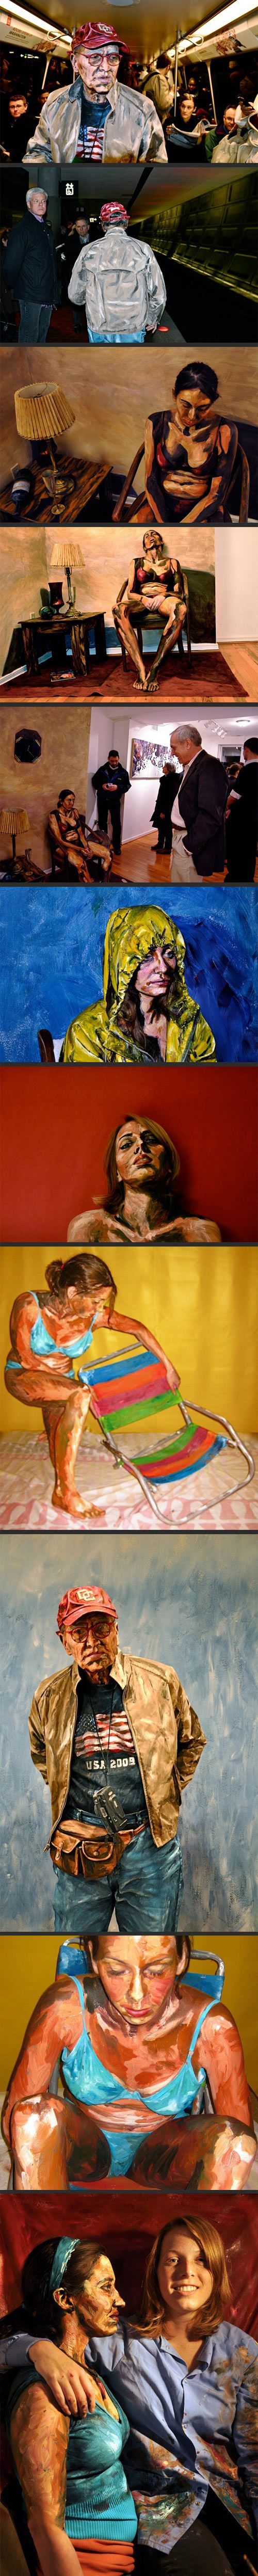 Hyper Realistic Acrylic Body Painting